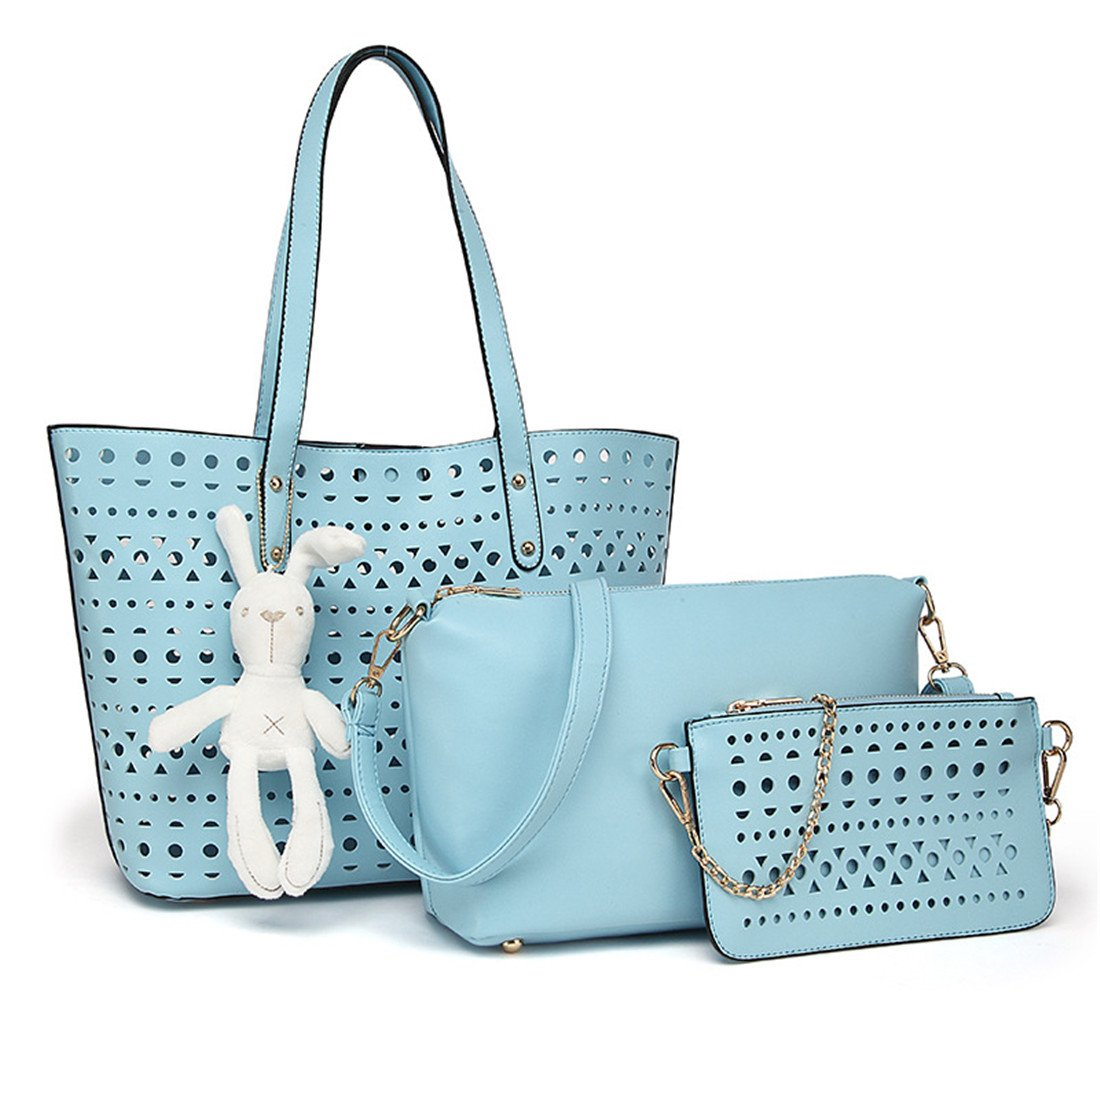 Luckywe Leather Handbag Hollow Parents 3 Pieces Tote Set Large Capacity Shoulder Purse Crossbody